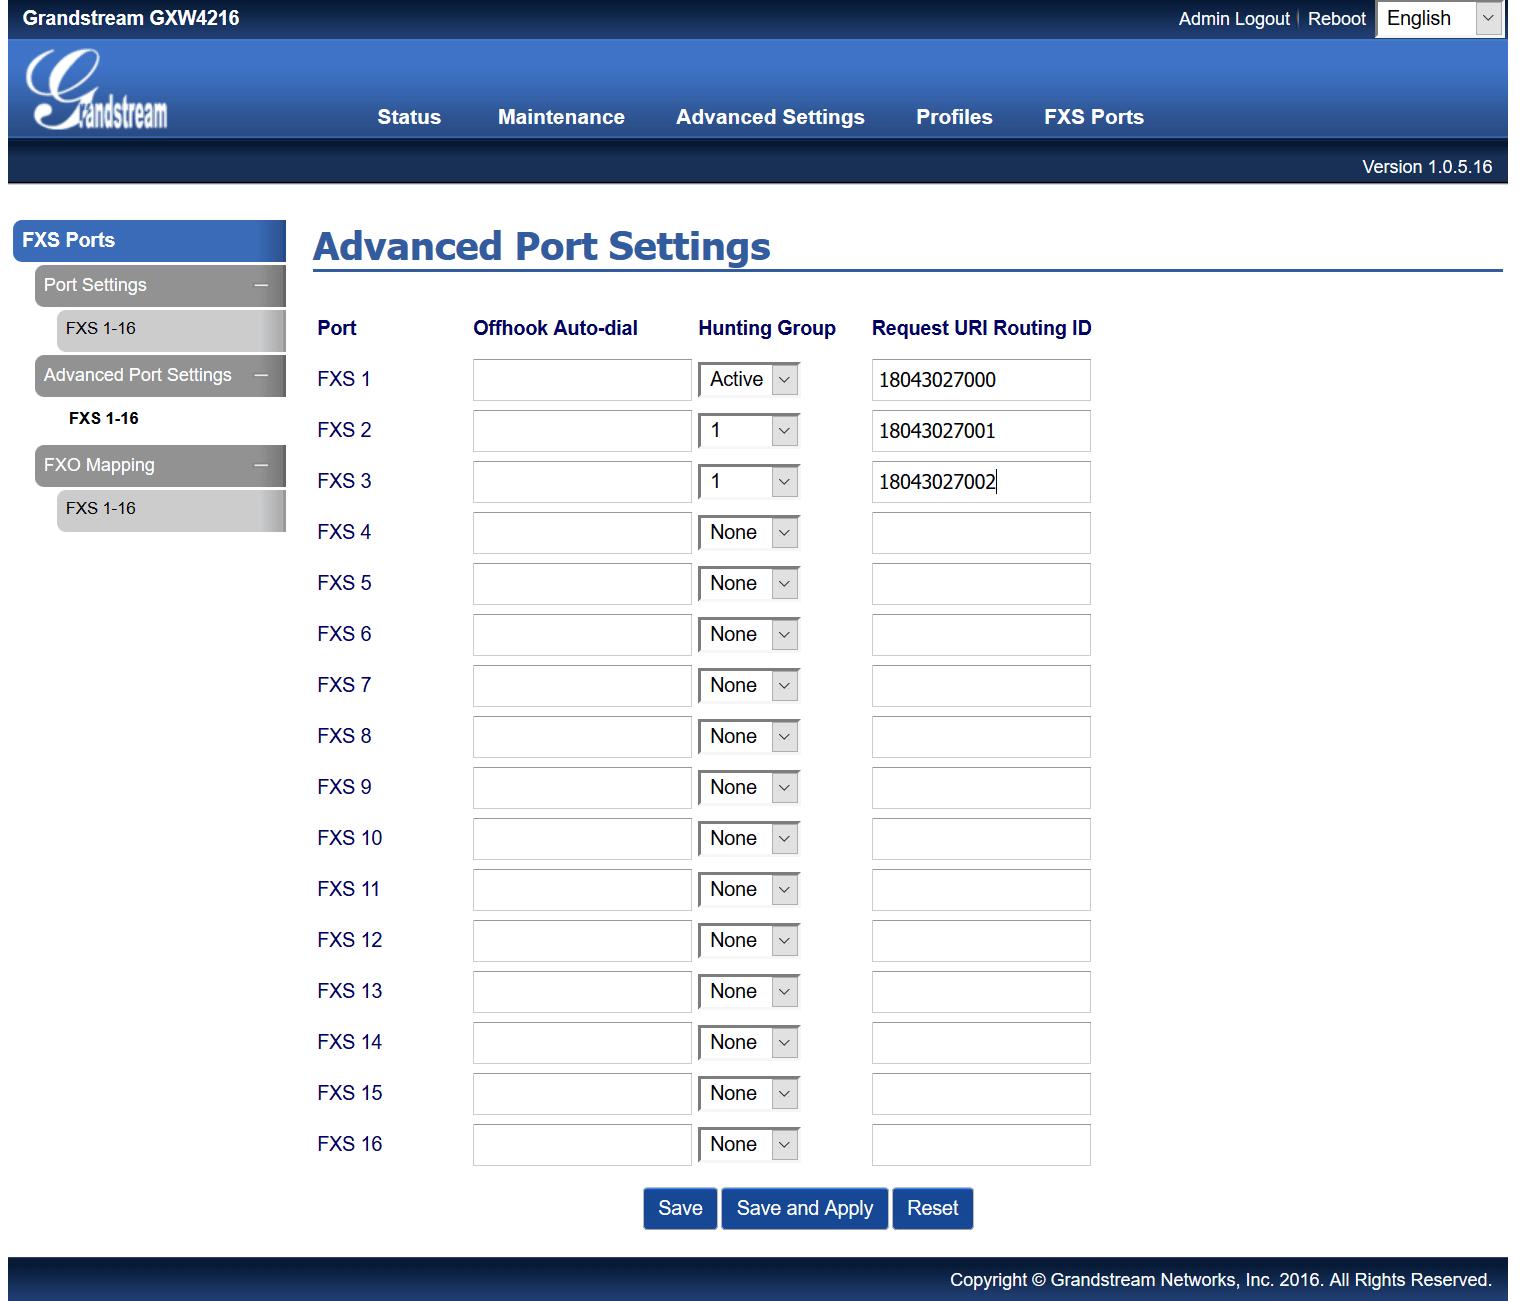 Grandstream GXW4200 - FXS Ports - Advanced Port Settings